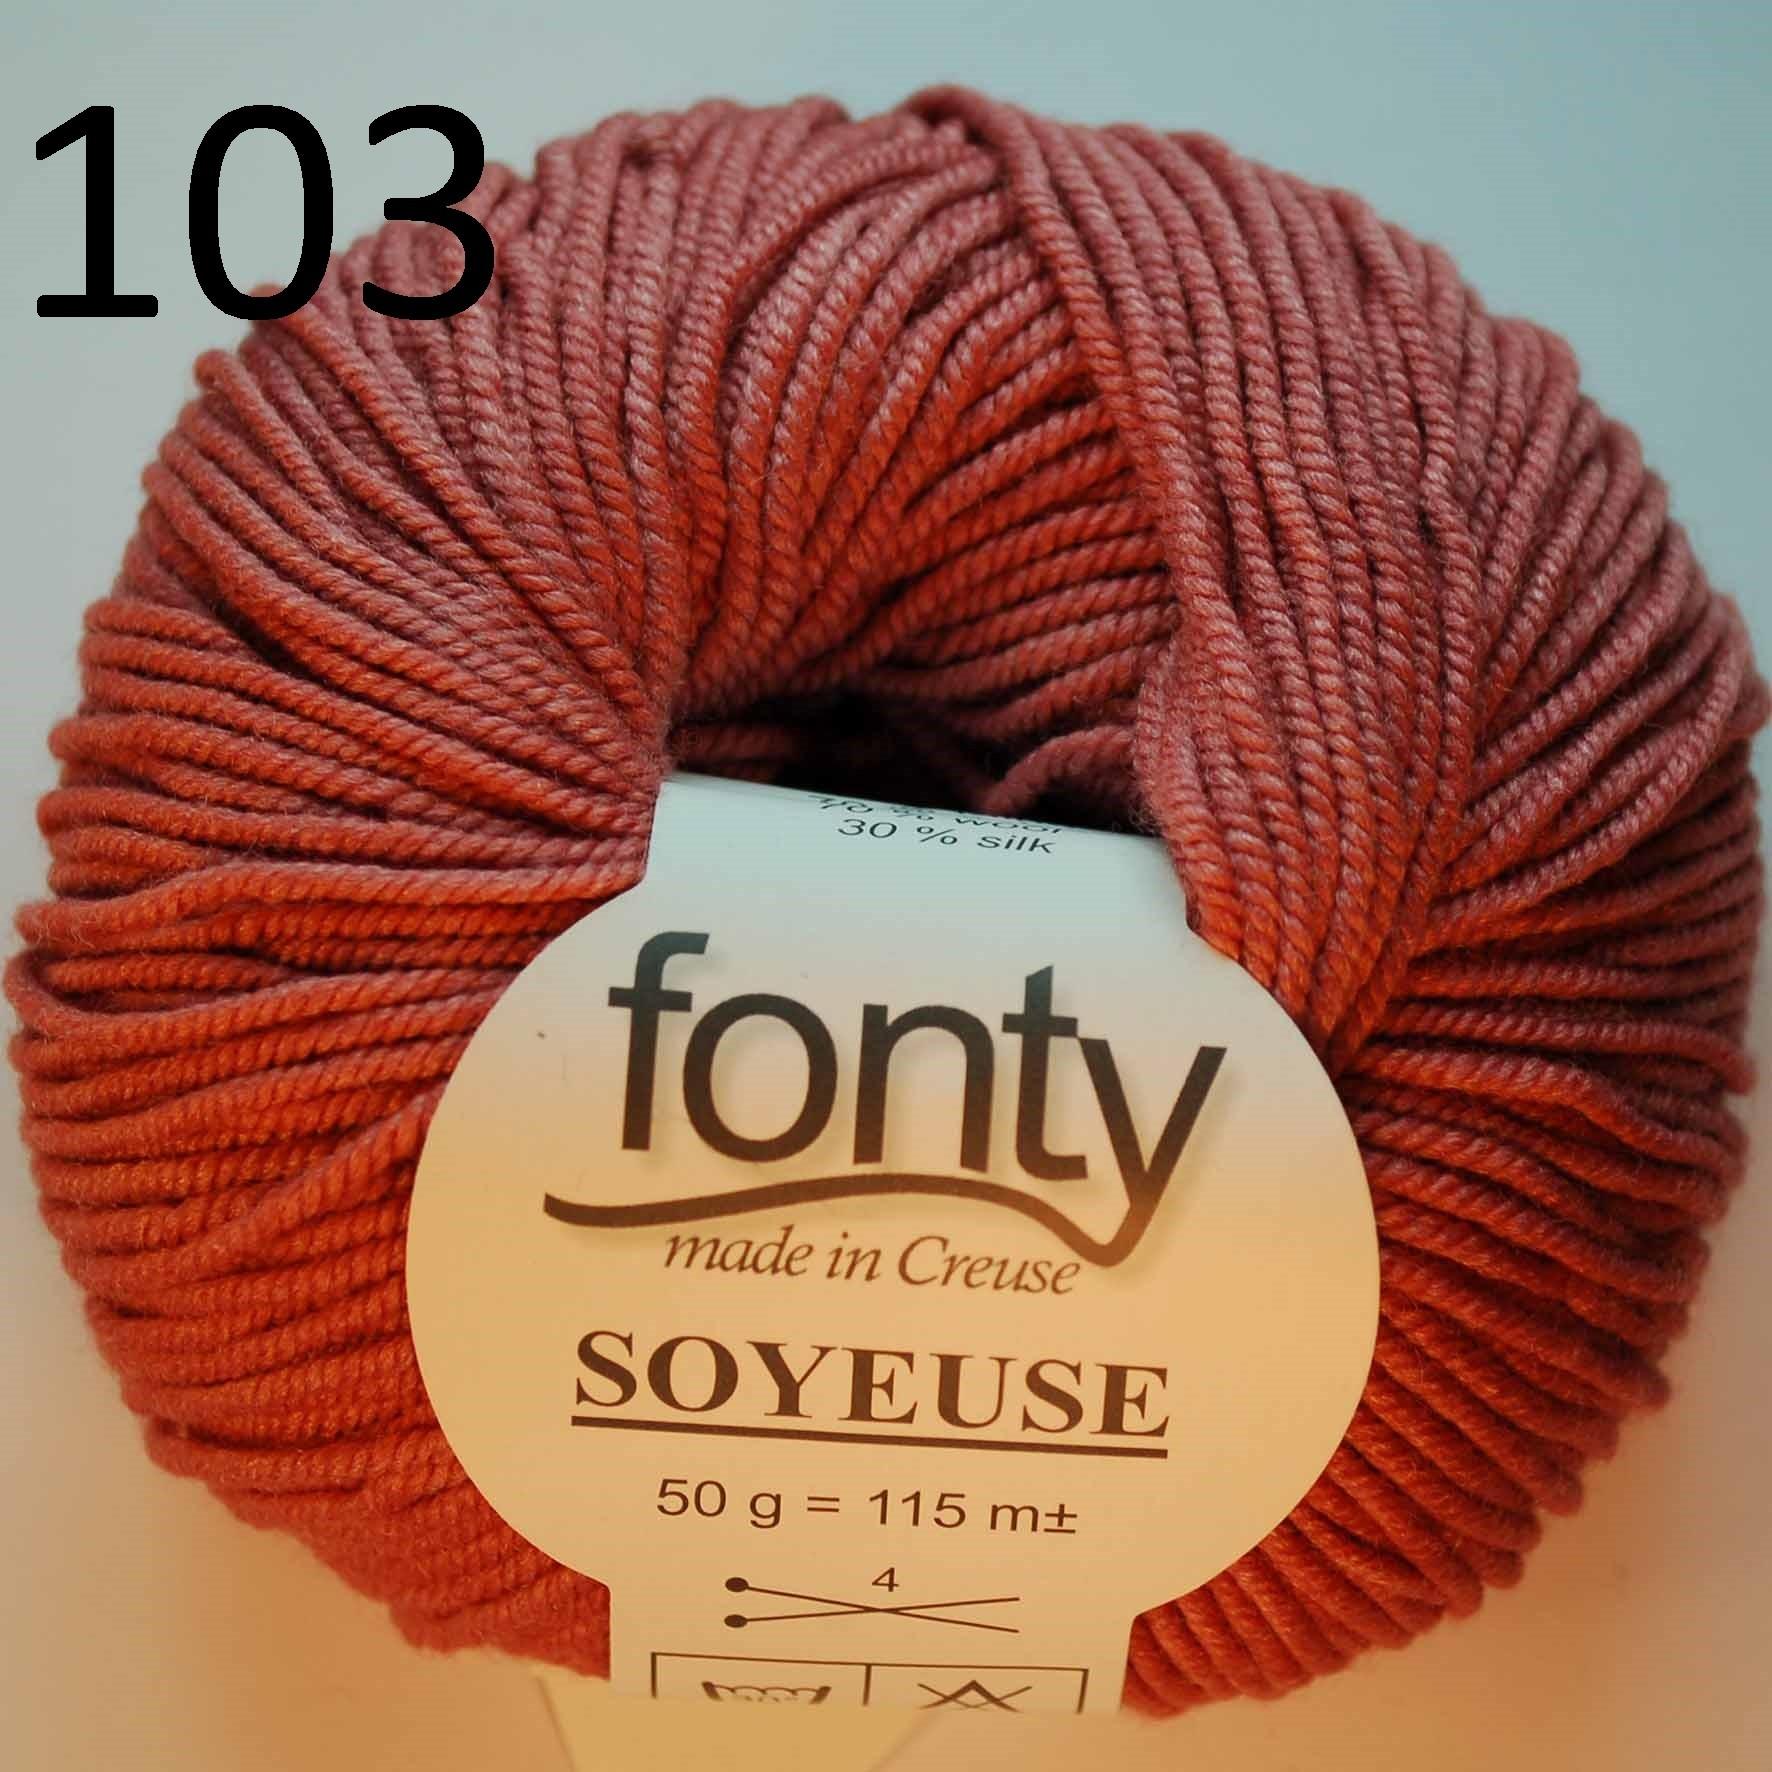 Soyeuse 103